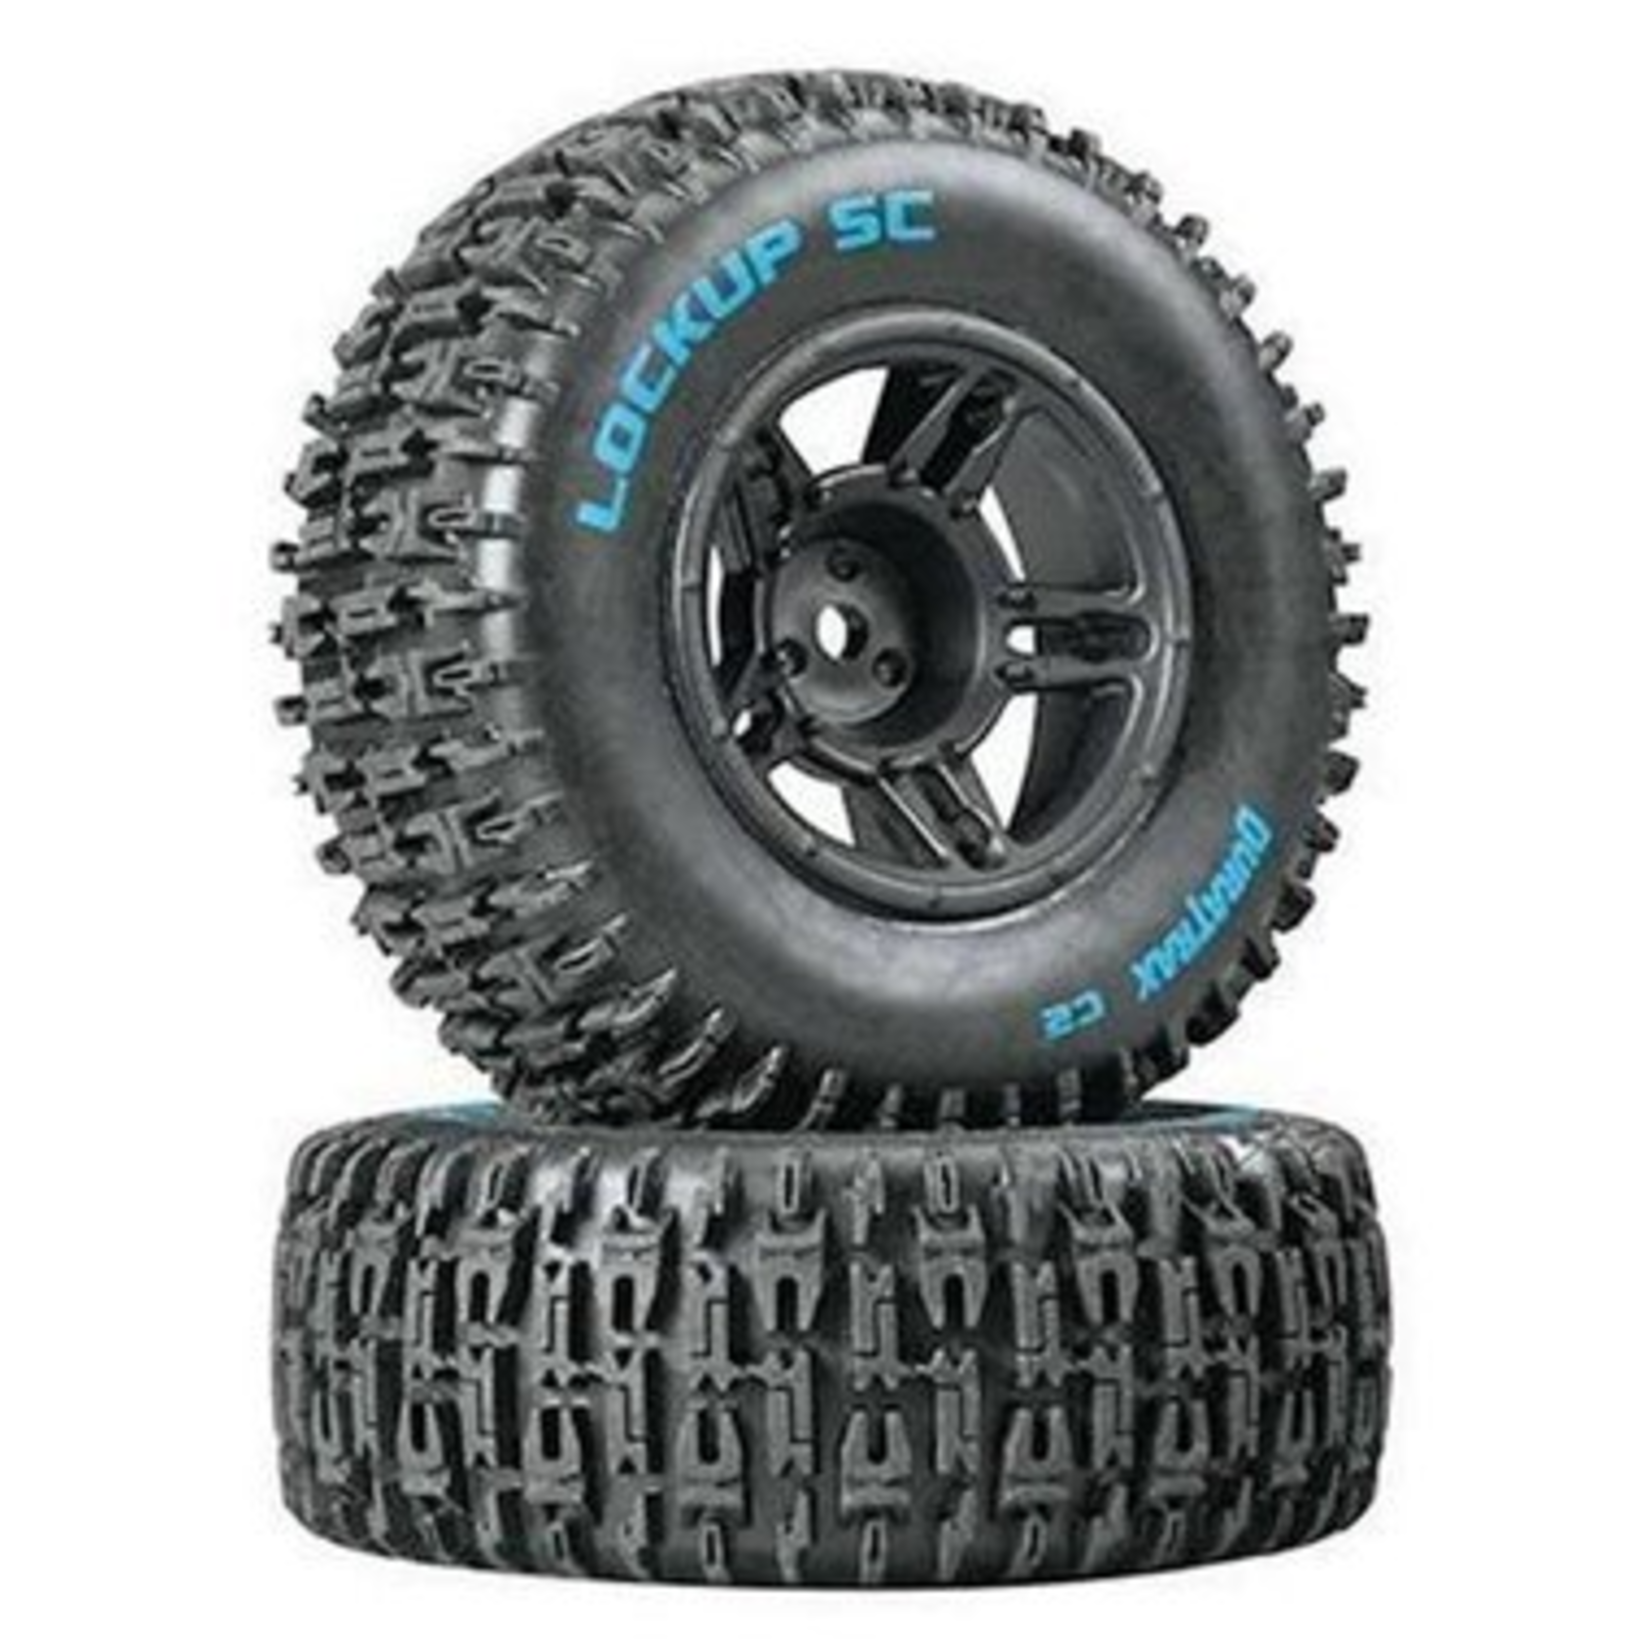 Duratrax DTXC3670 Duratrax Lockup SC Tire C2 Mounted Black Front Slash(2)